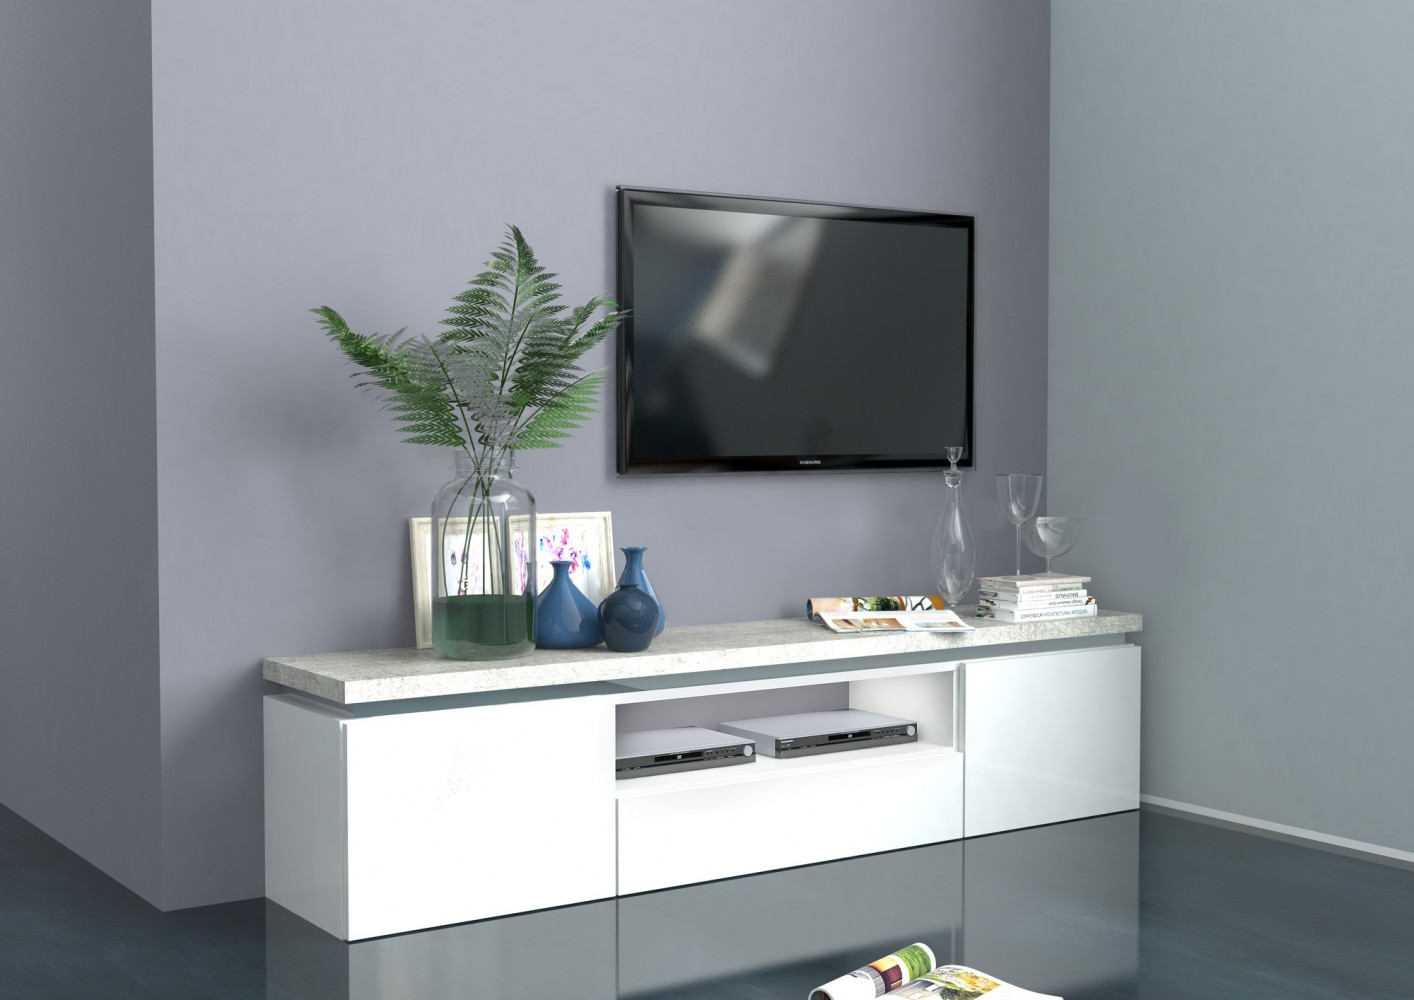 Tecnos GAZEBO Lowboard, 180cm Wohnwand Mediawand TV Italian Design ...